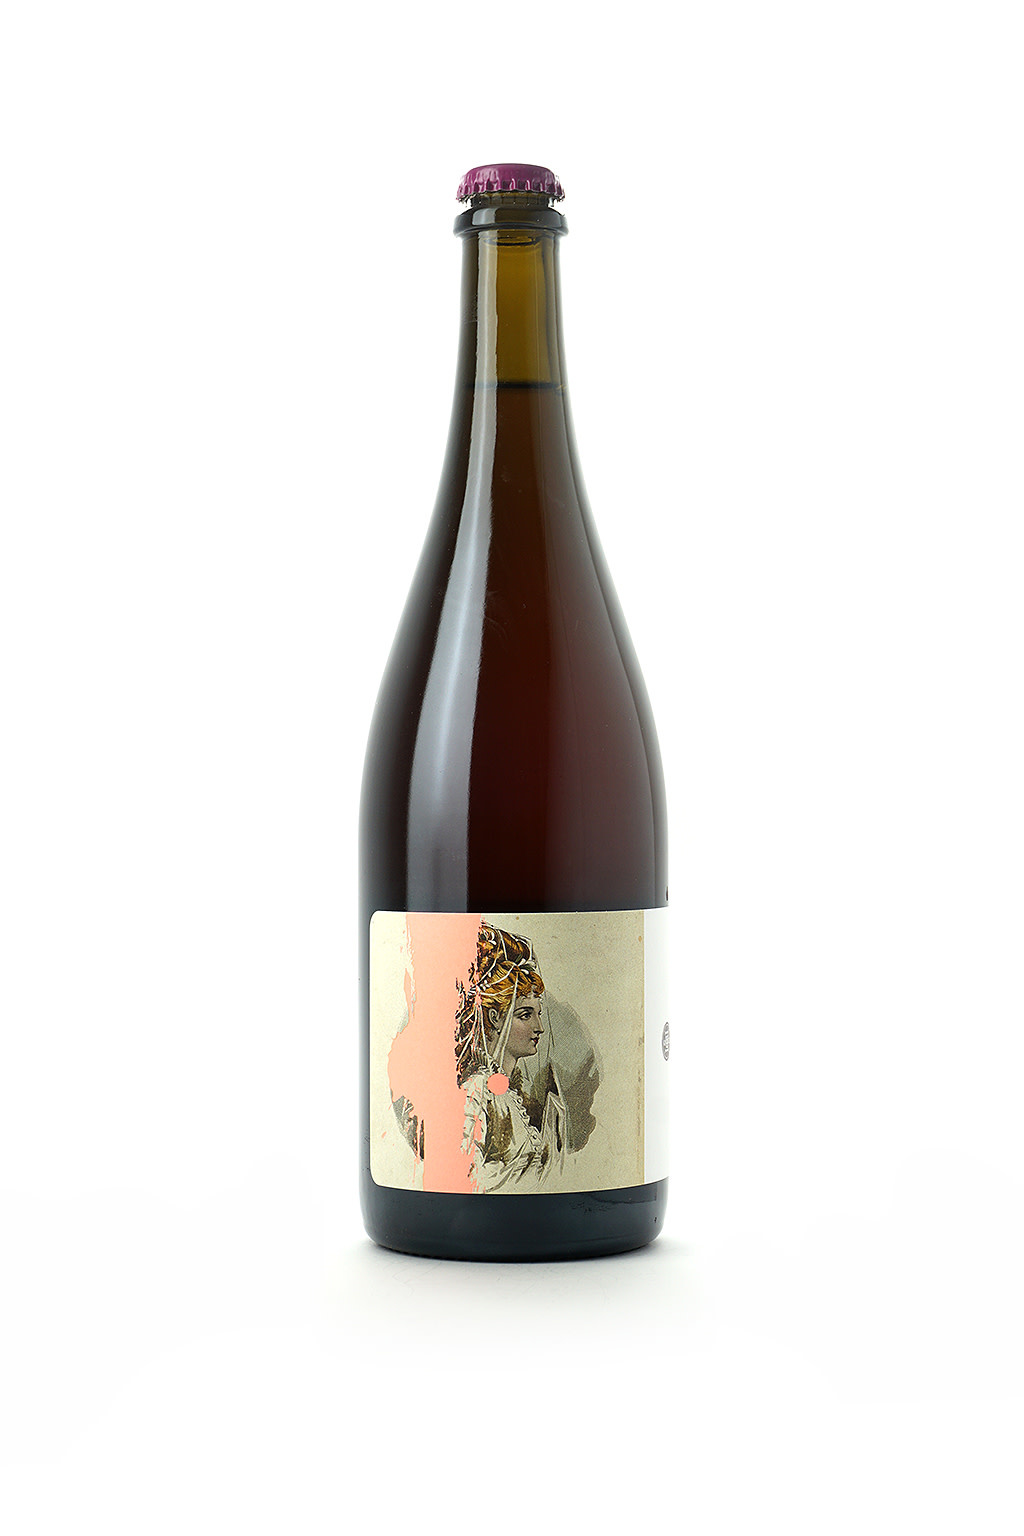 Cruse Wine Co Sparkling Valdiguie Deming Vyd 2019